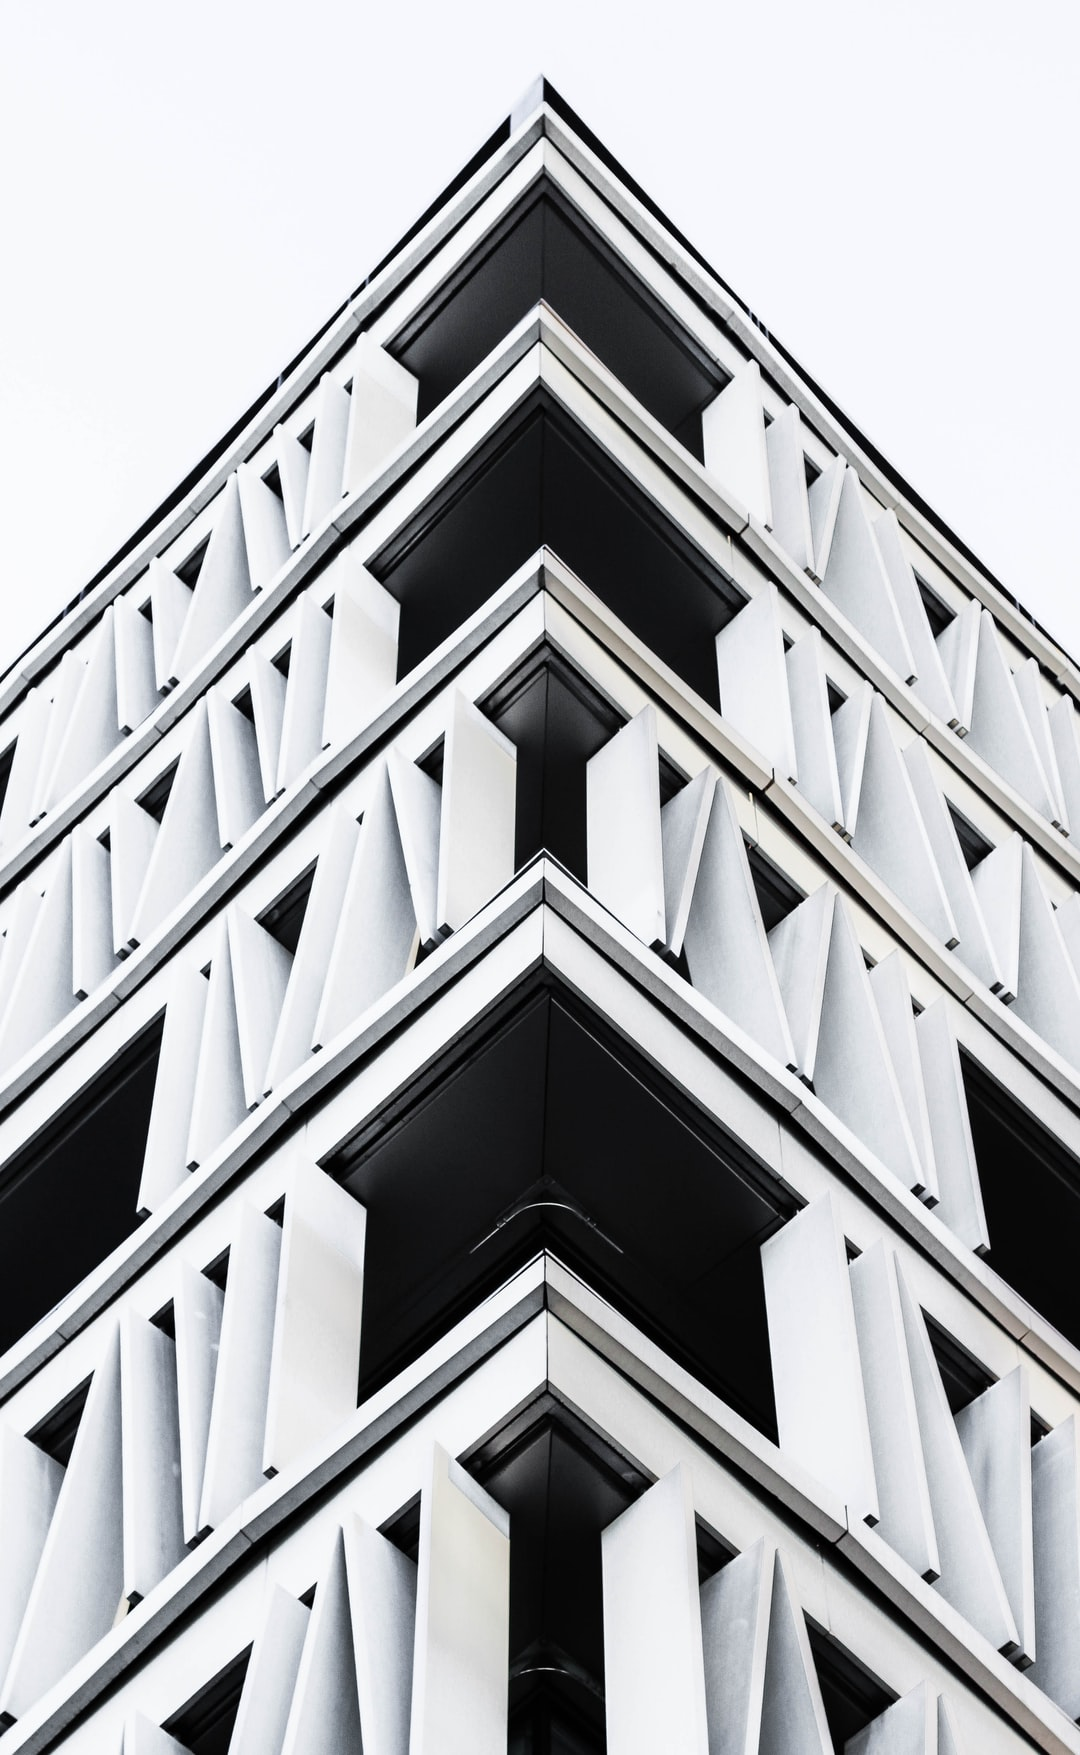 Monotone architecture corner photo by Joel Filipe (@joelfilip) on Unsplash